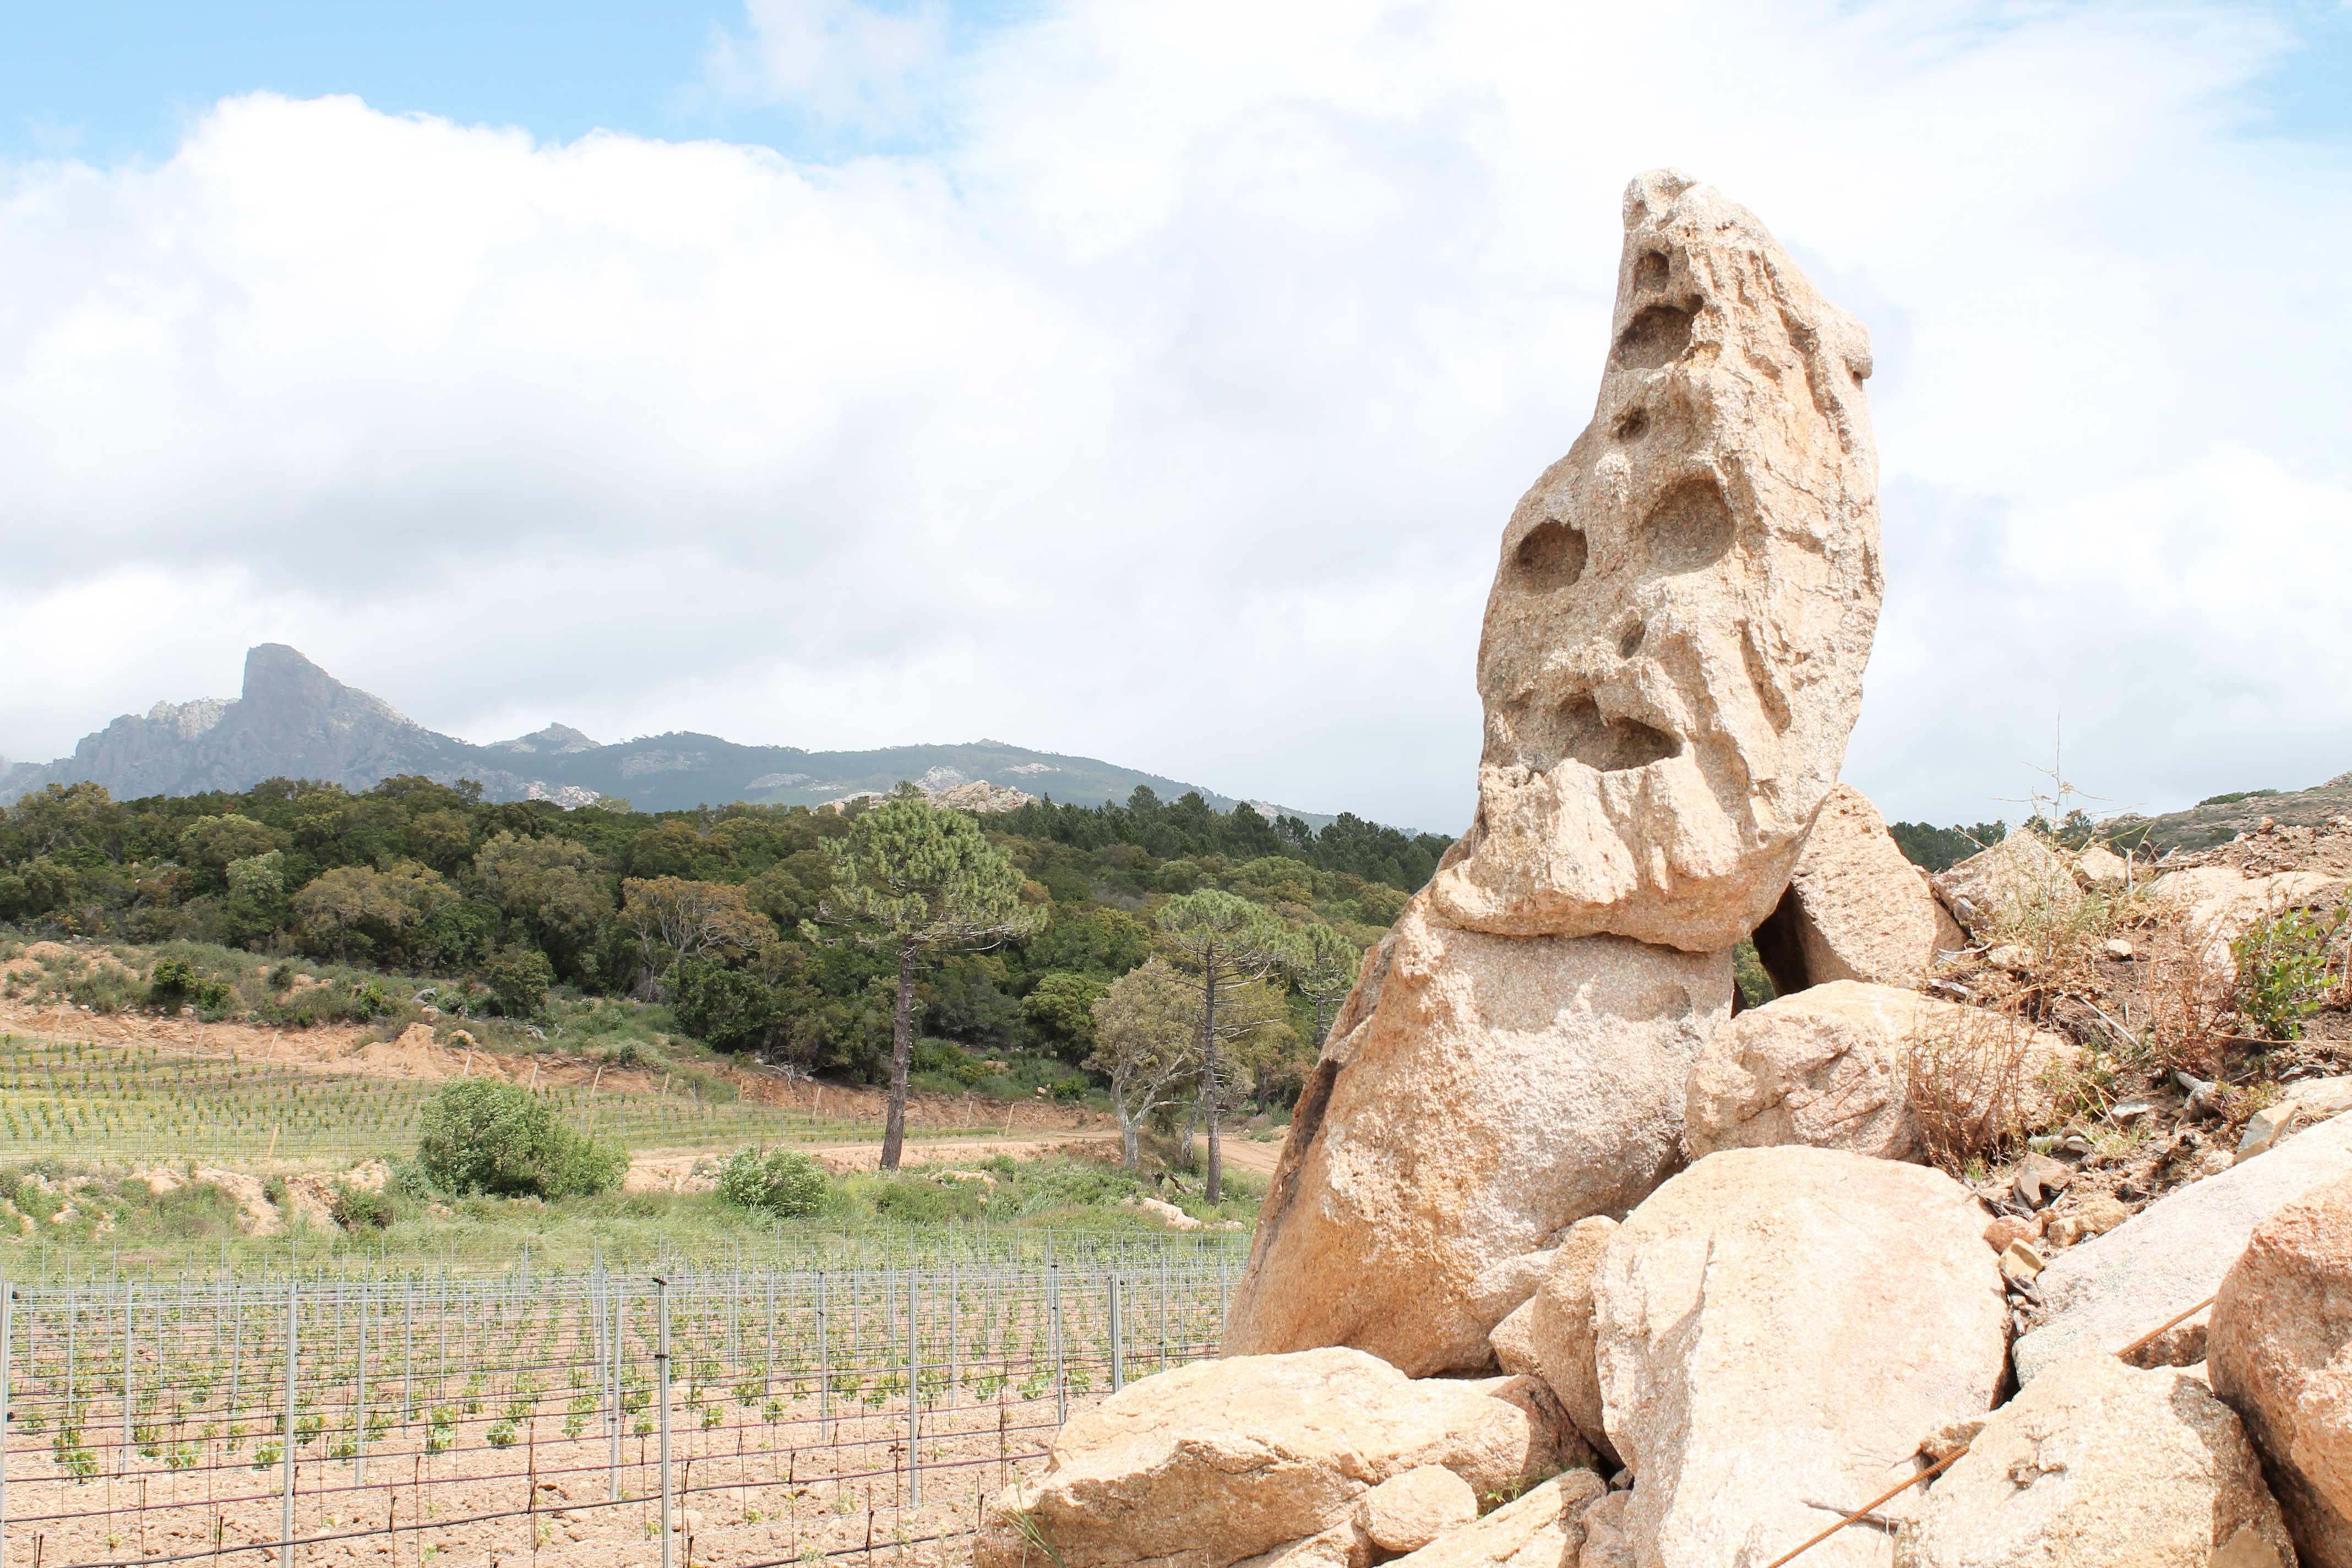 Corsica wine tour, strange outcrop near vineyard